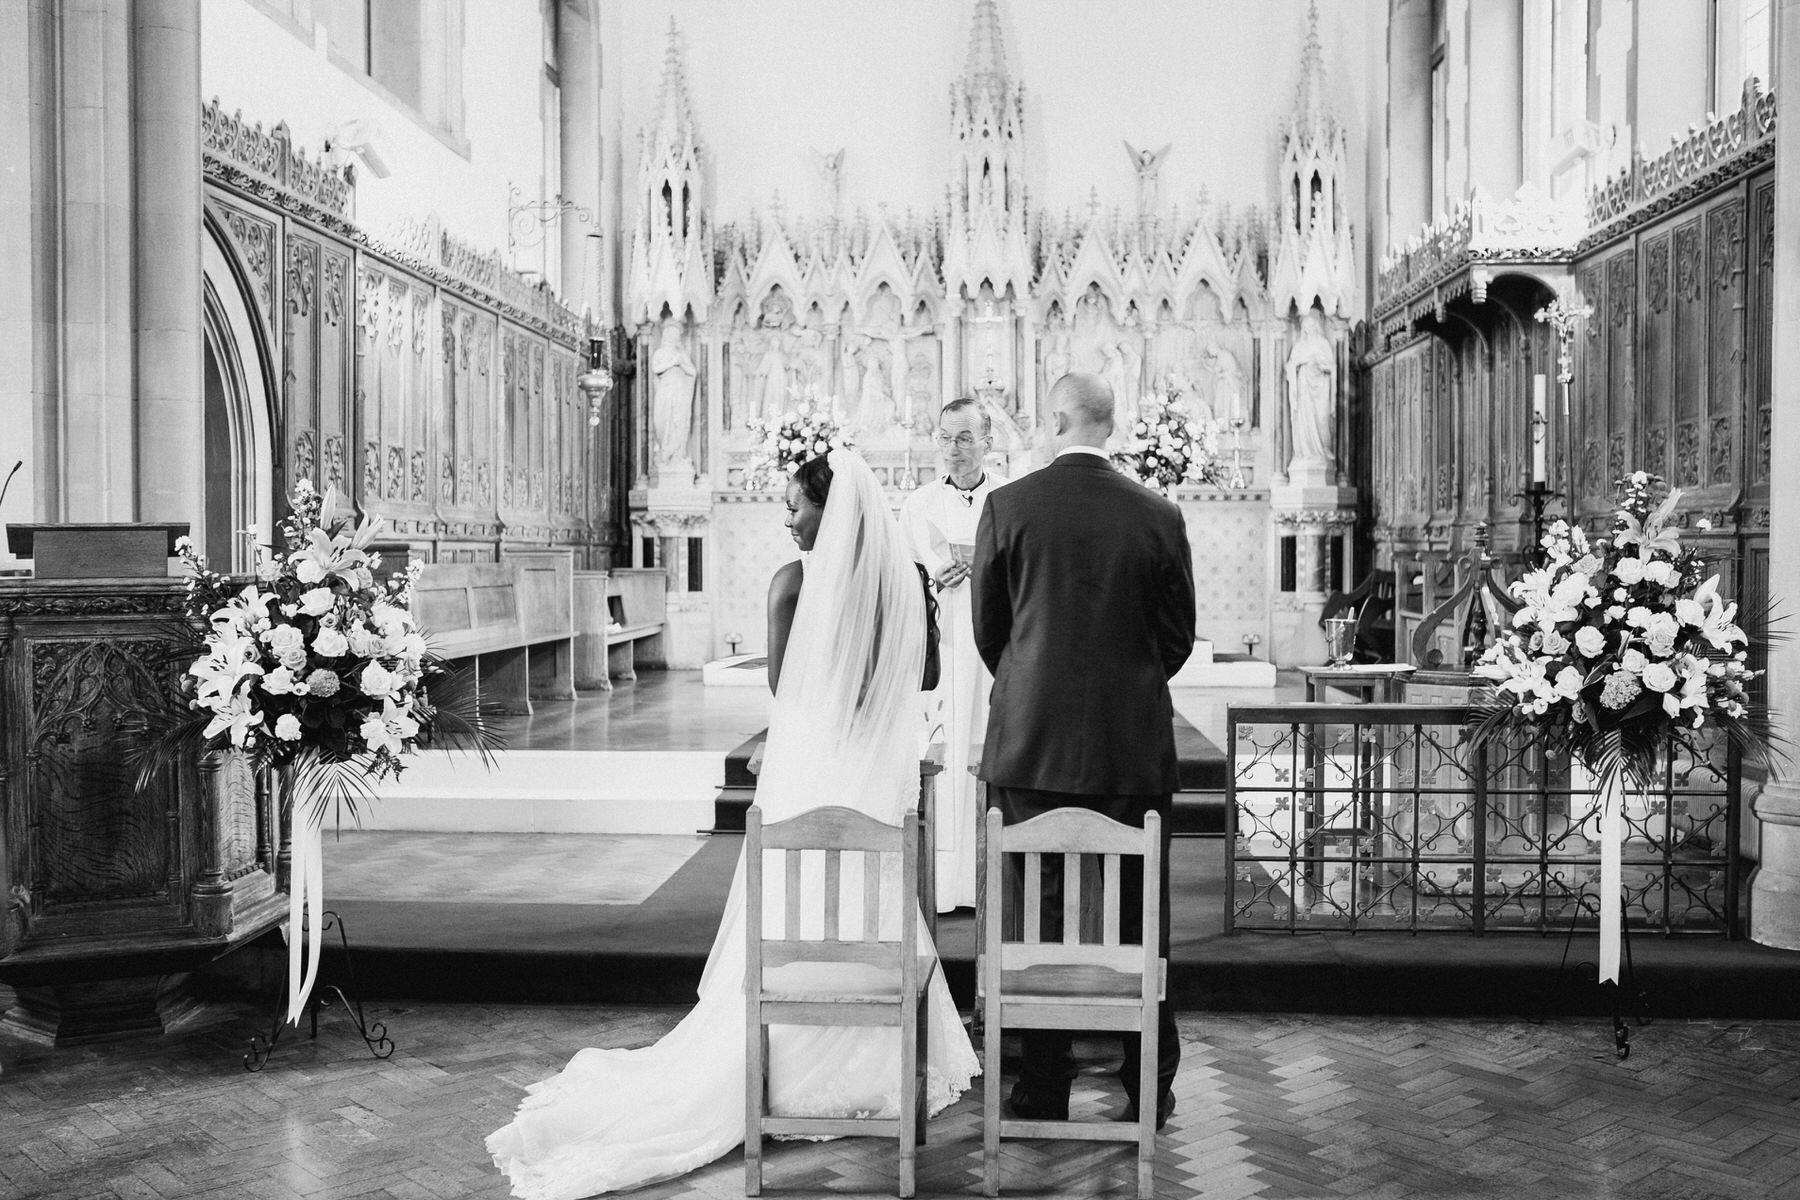 76 bride looks back during ceremony.jpg